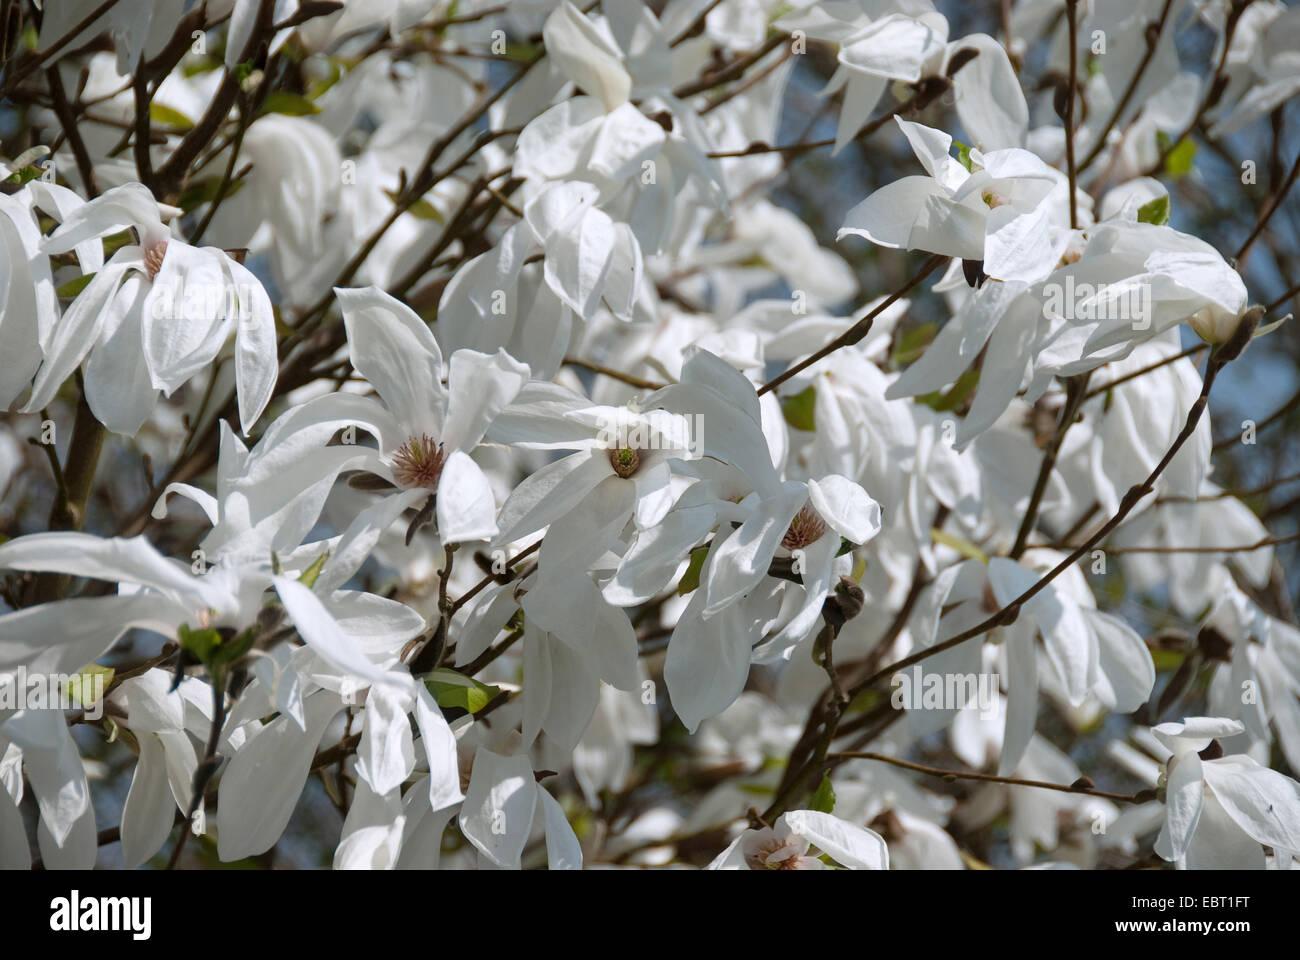 Magnolia (Magnolia 'Wada's memory' Magnolia, mémoire de l'AMA), de l'AMA, le cultivar de Photo Stock